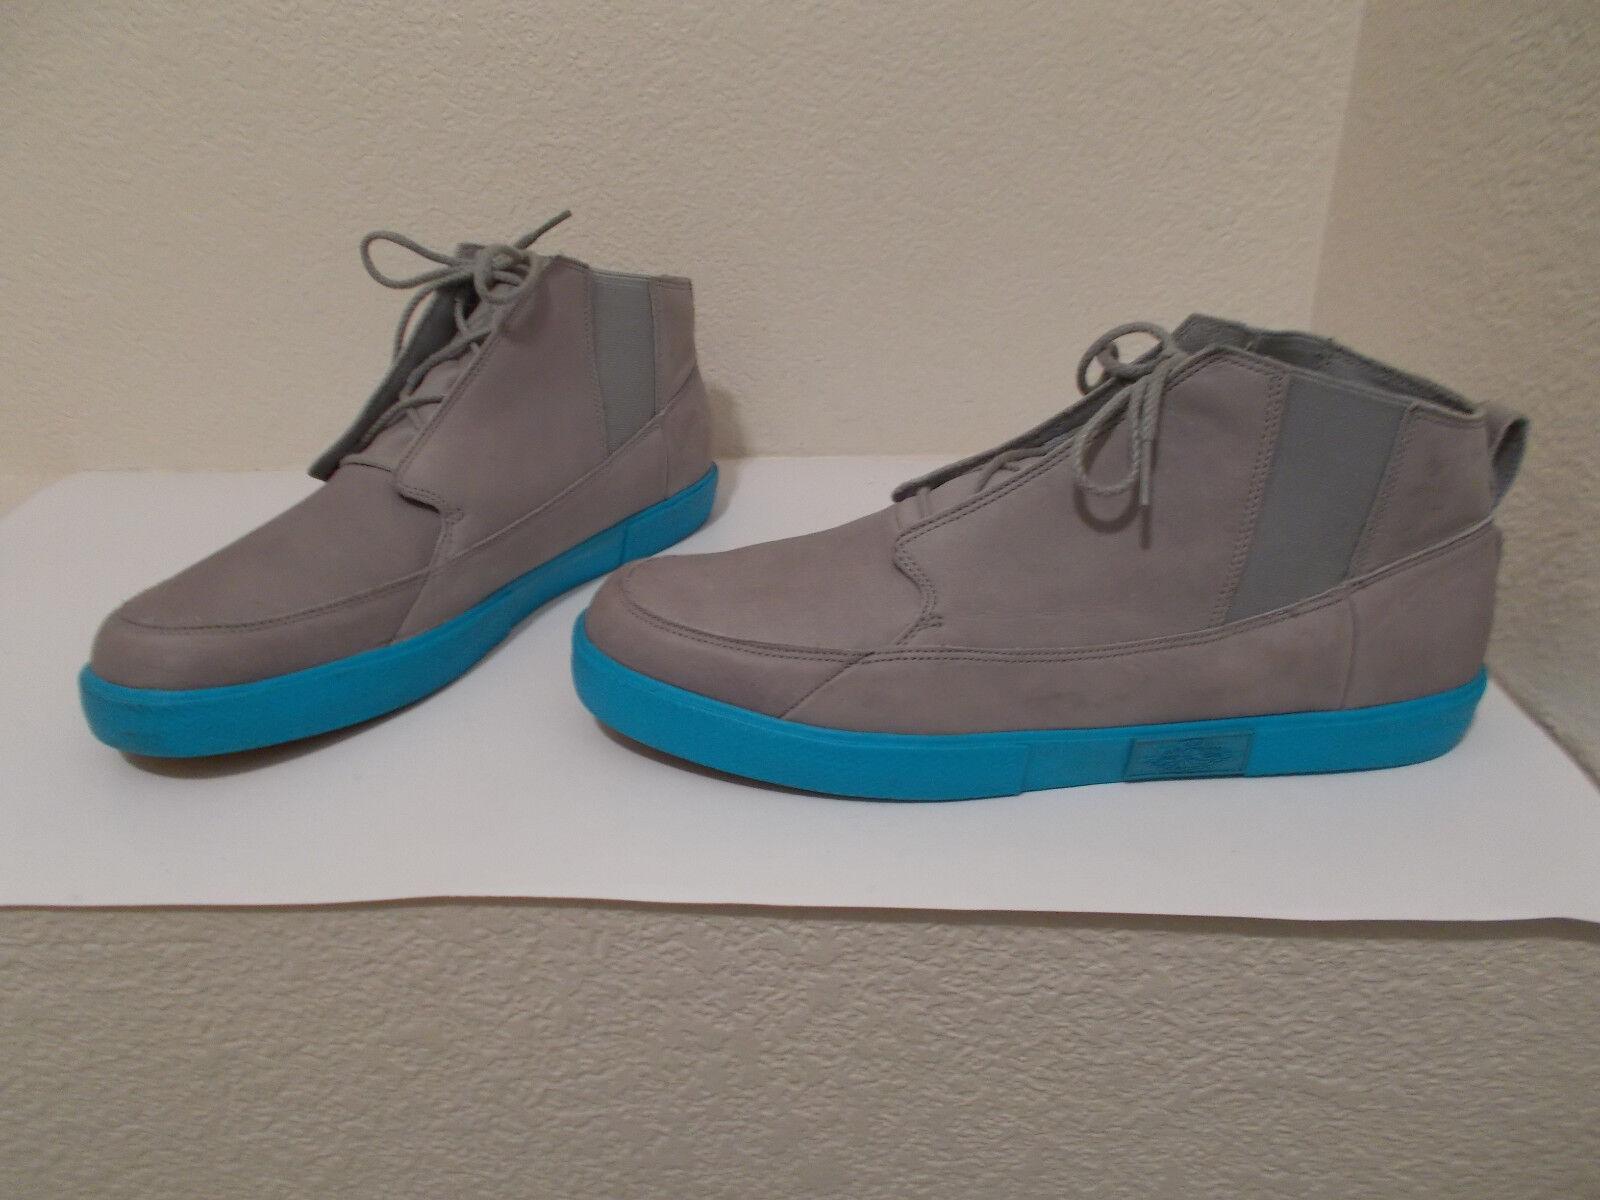 Nike Air Jordan V.2 Grown Matte Silver/Chlorine Blue-Spark 414174-005 Size 14